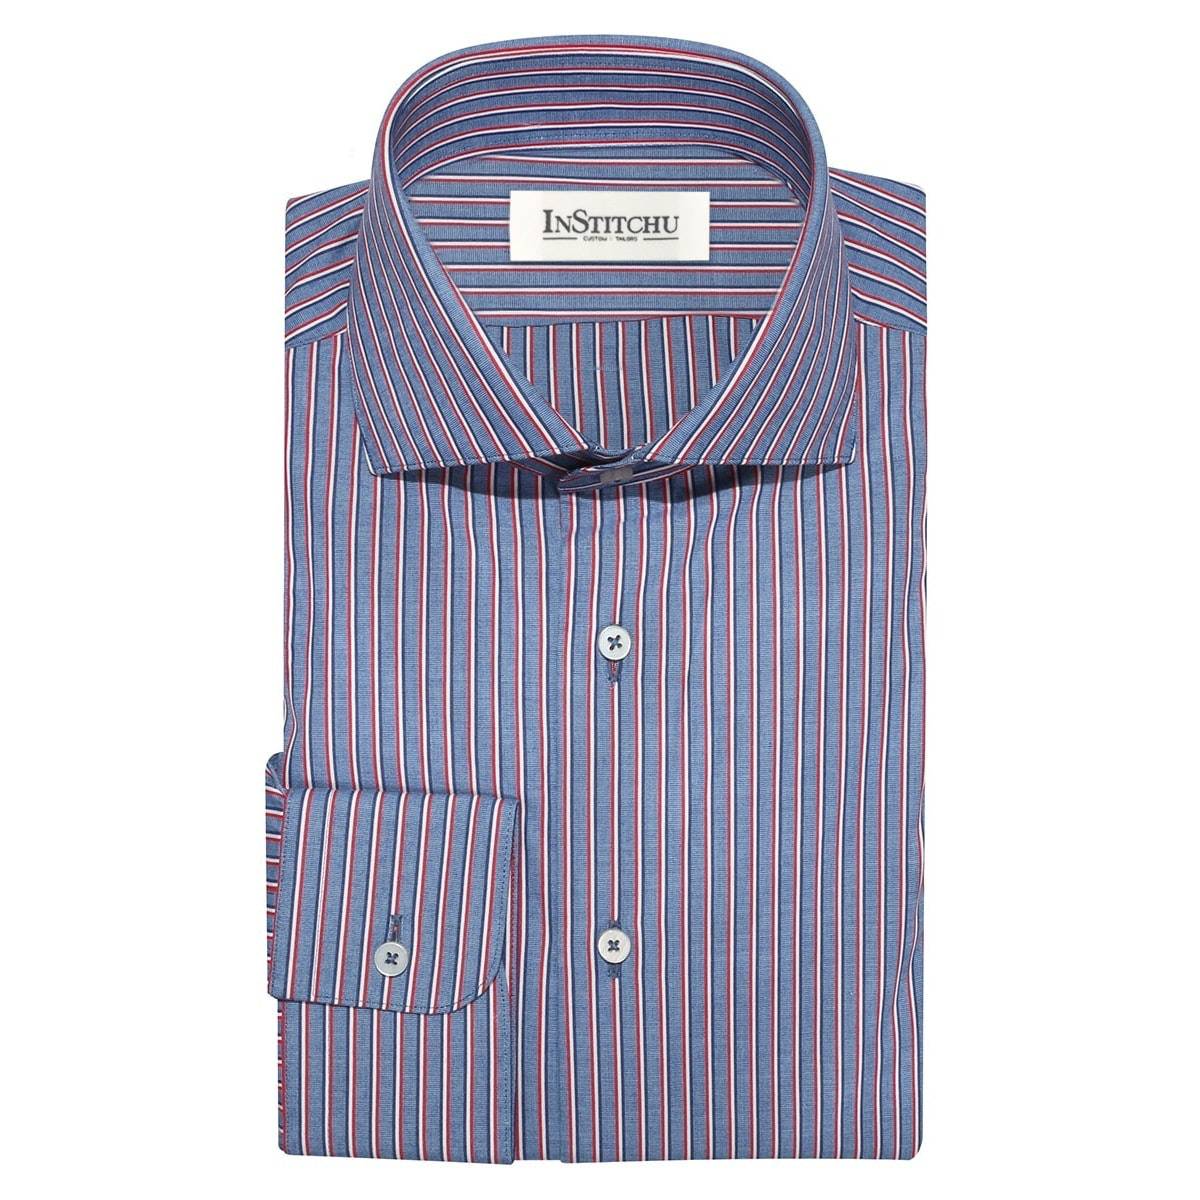 InStitchu Collection The Castaways Blue Stripe Shirt